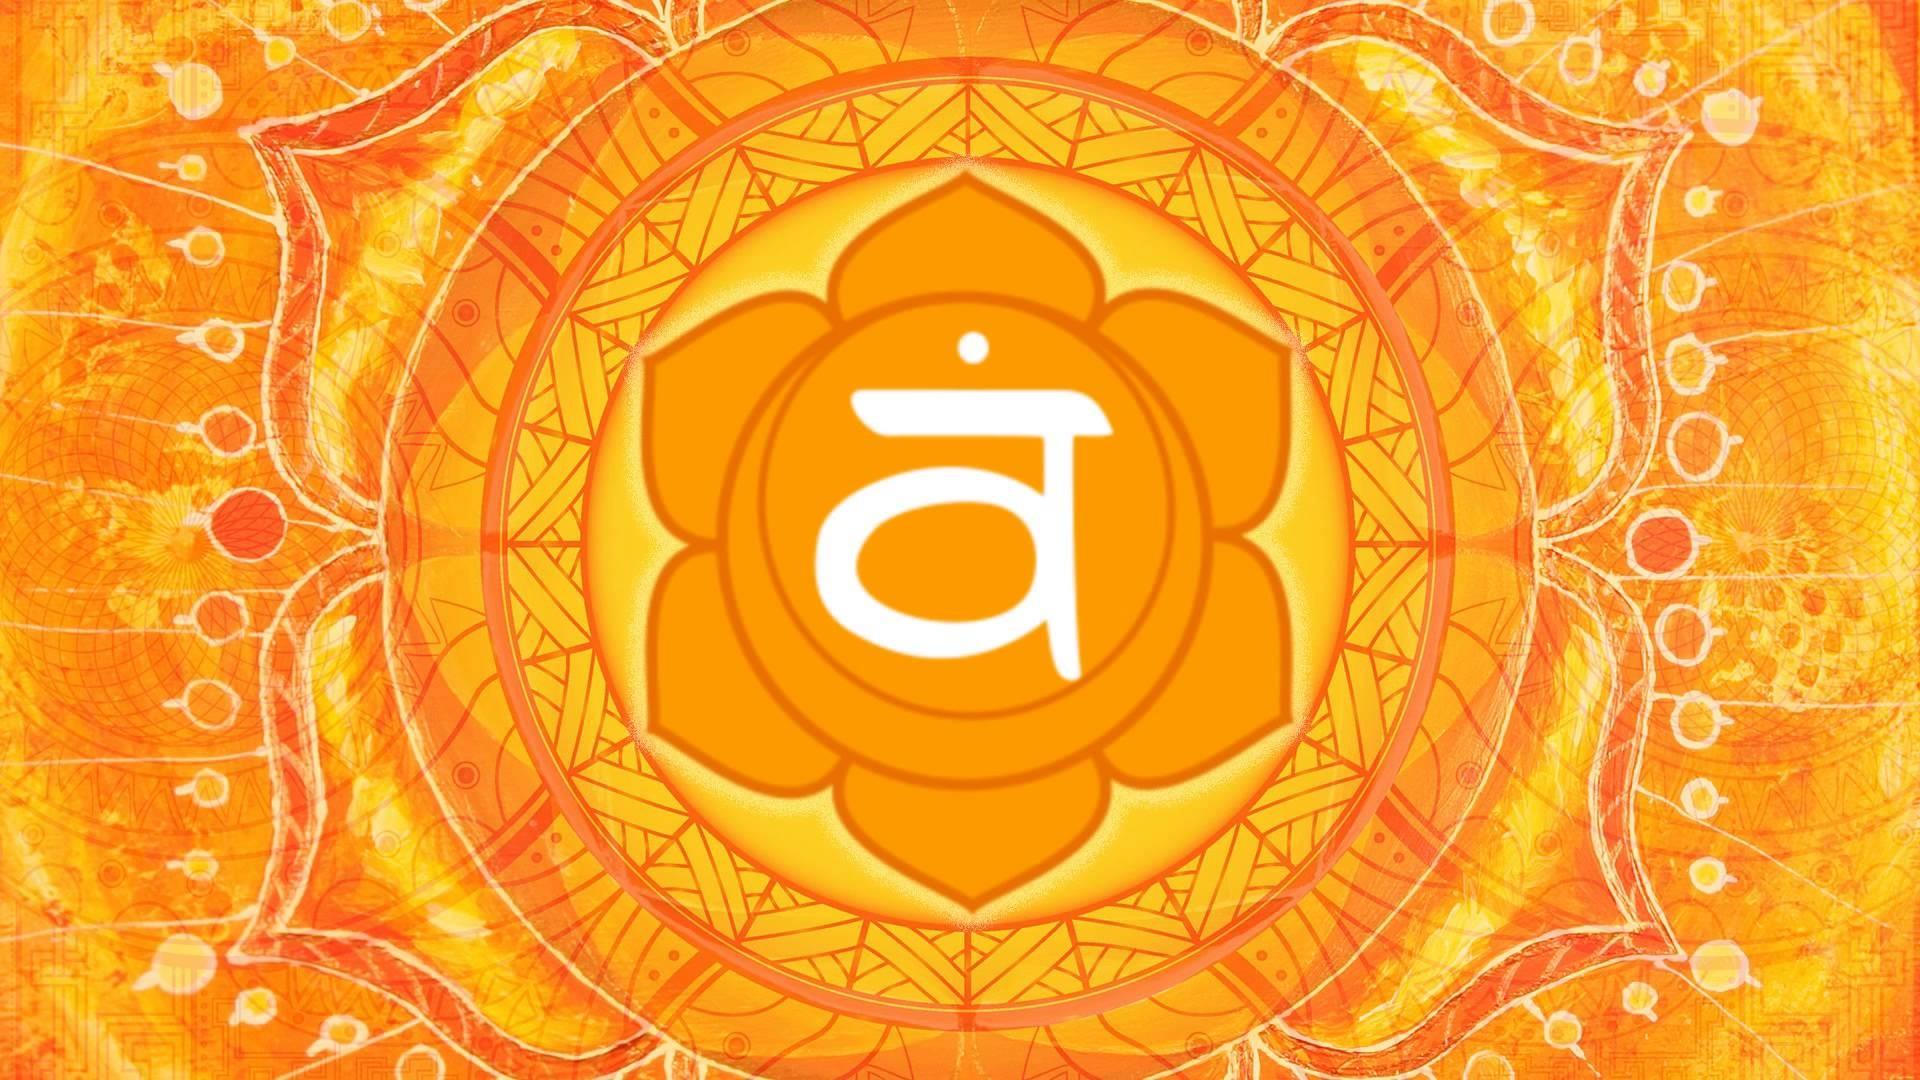 Celtic Meditation Music for Sacral Chakra Healing | Swaddhishthana – YouTube